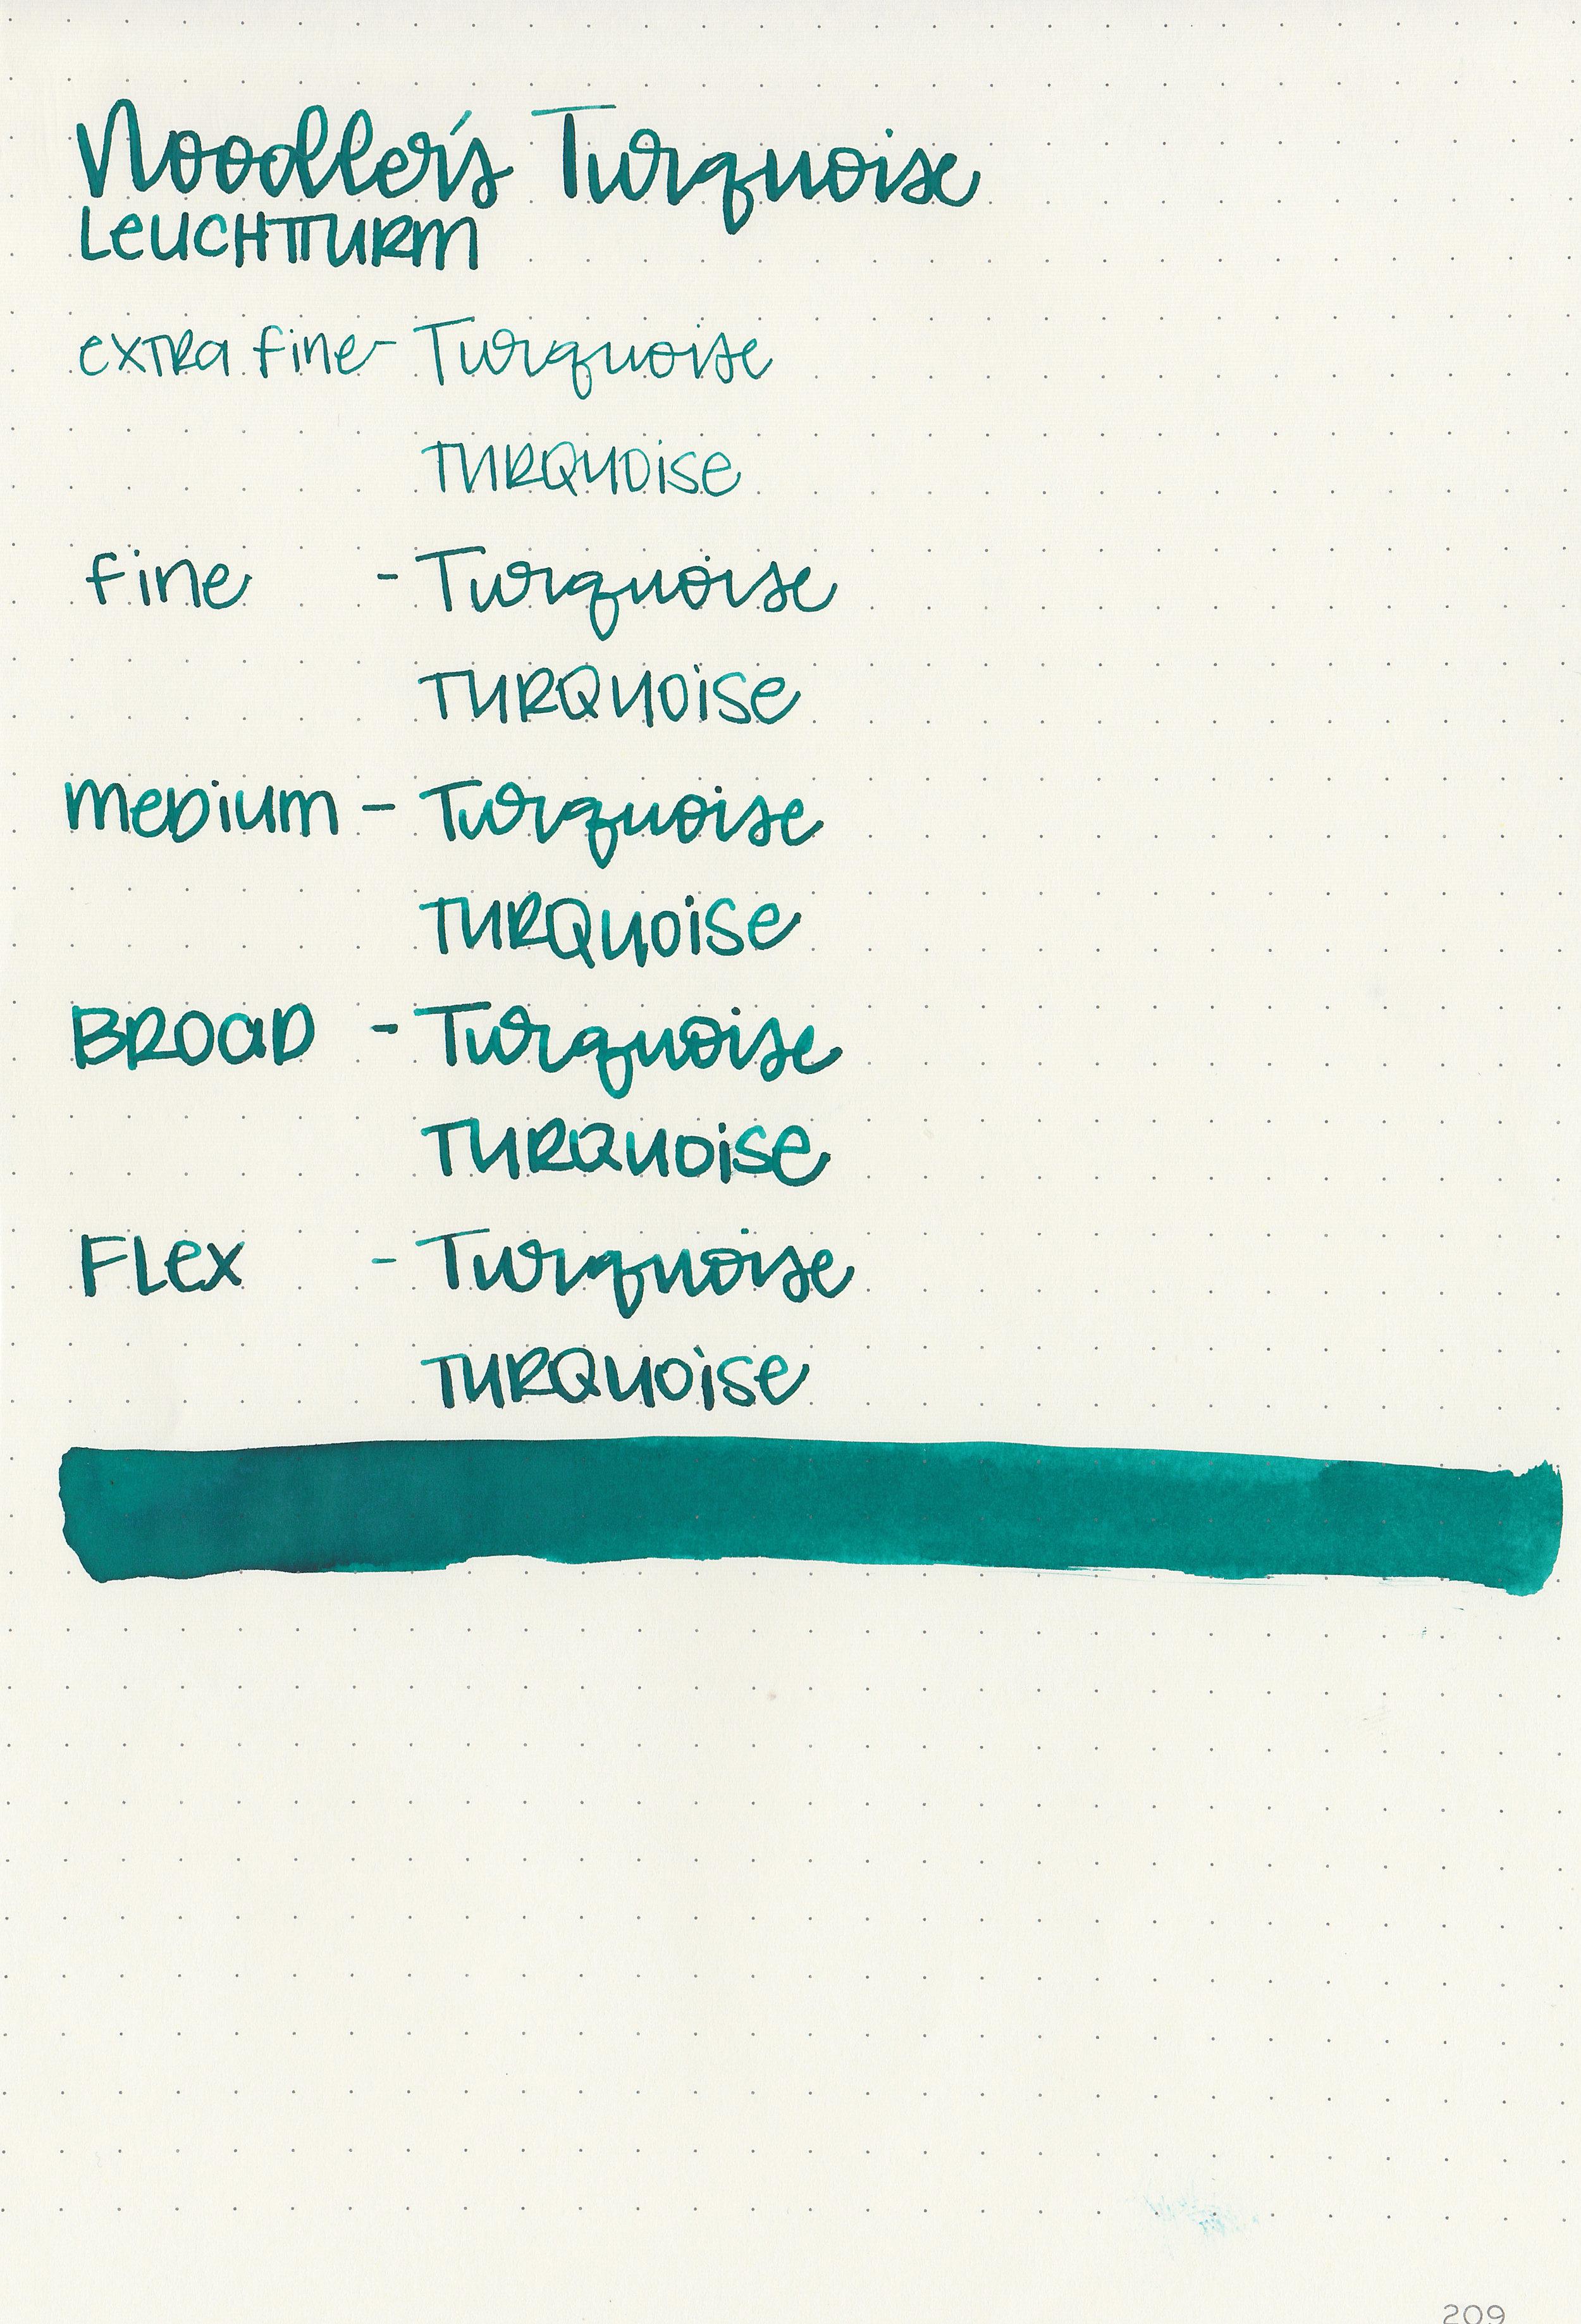 nood-turquoise-9.jpg